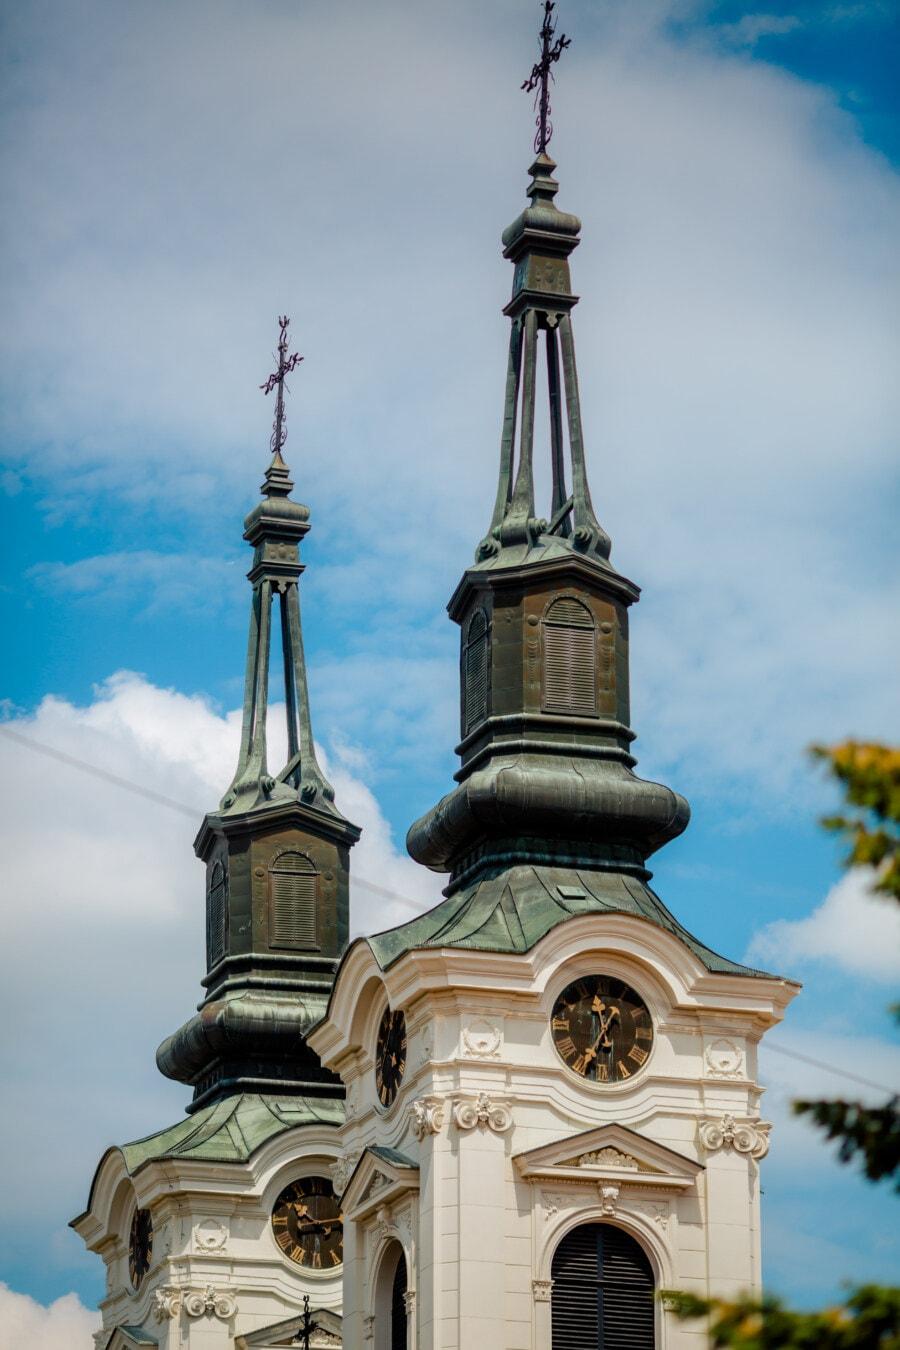 cathédrale, orthodoxe, steeple, Christianisme, baroque, Croix, toit, religion, architecture, dôme